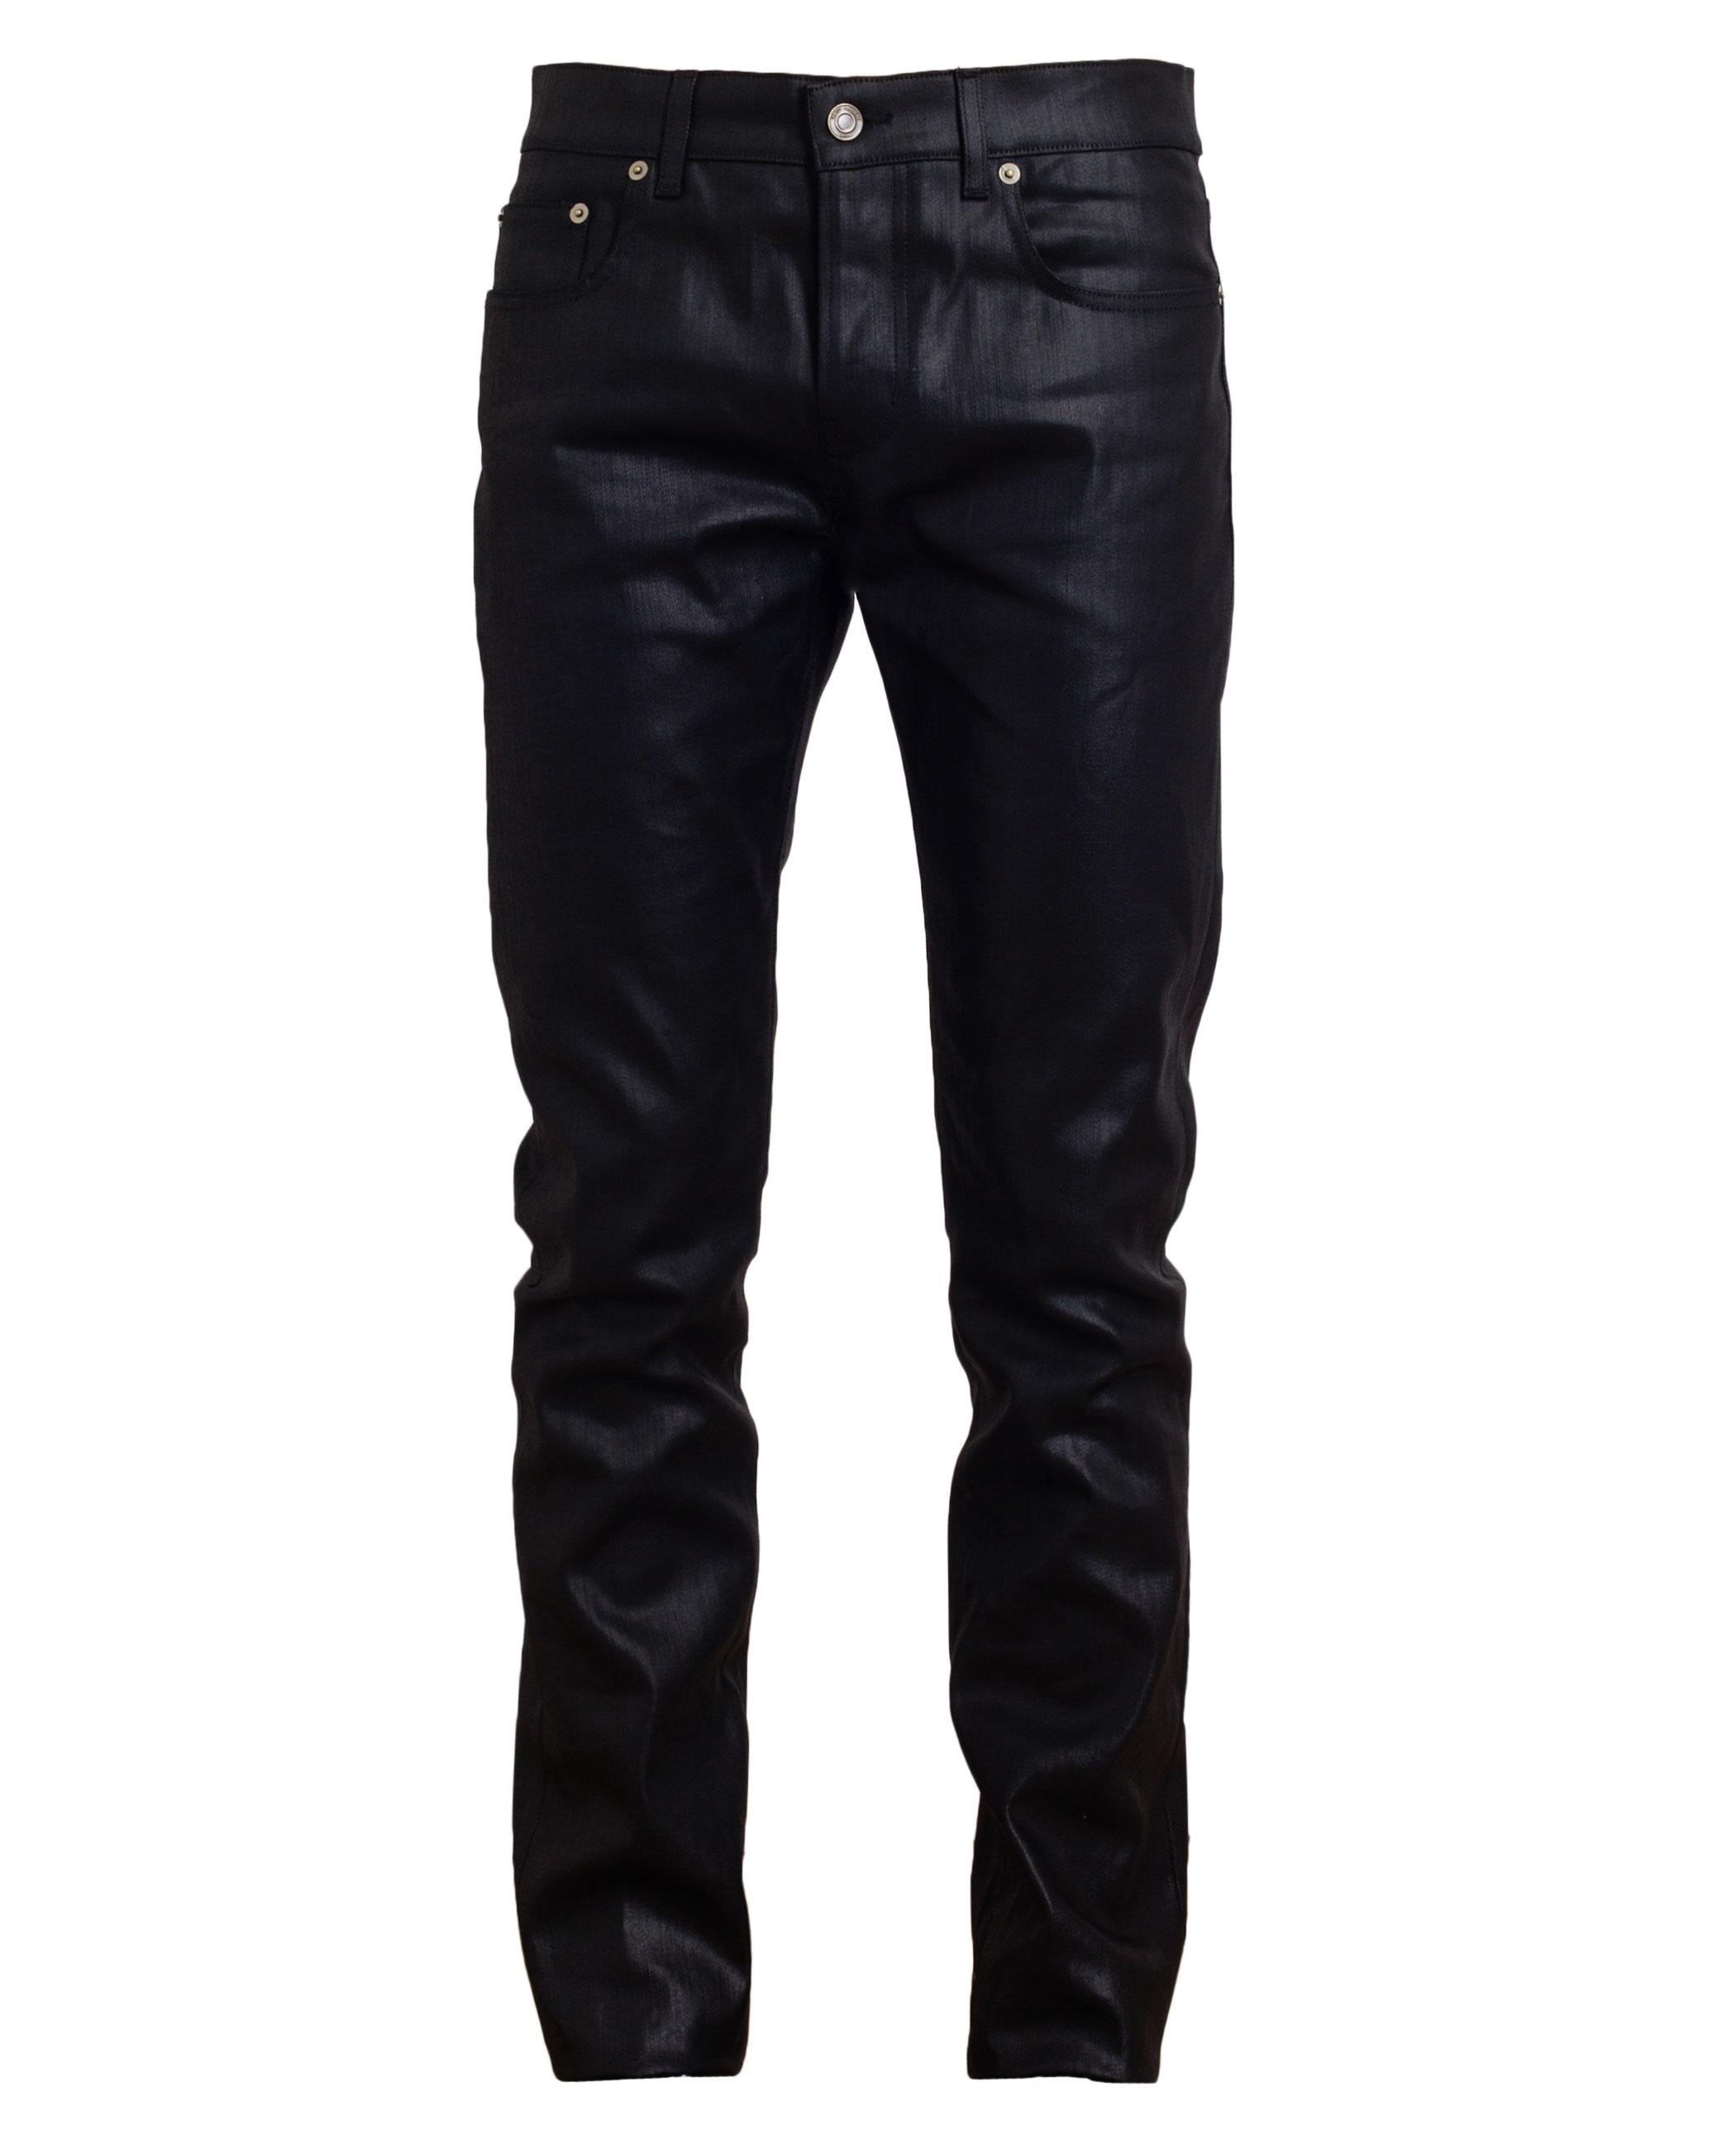 Cheap Mens True Religion Jeans